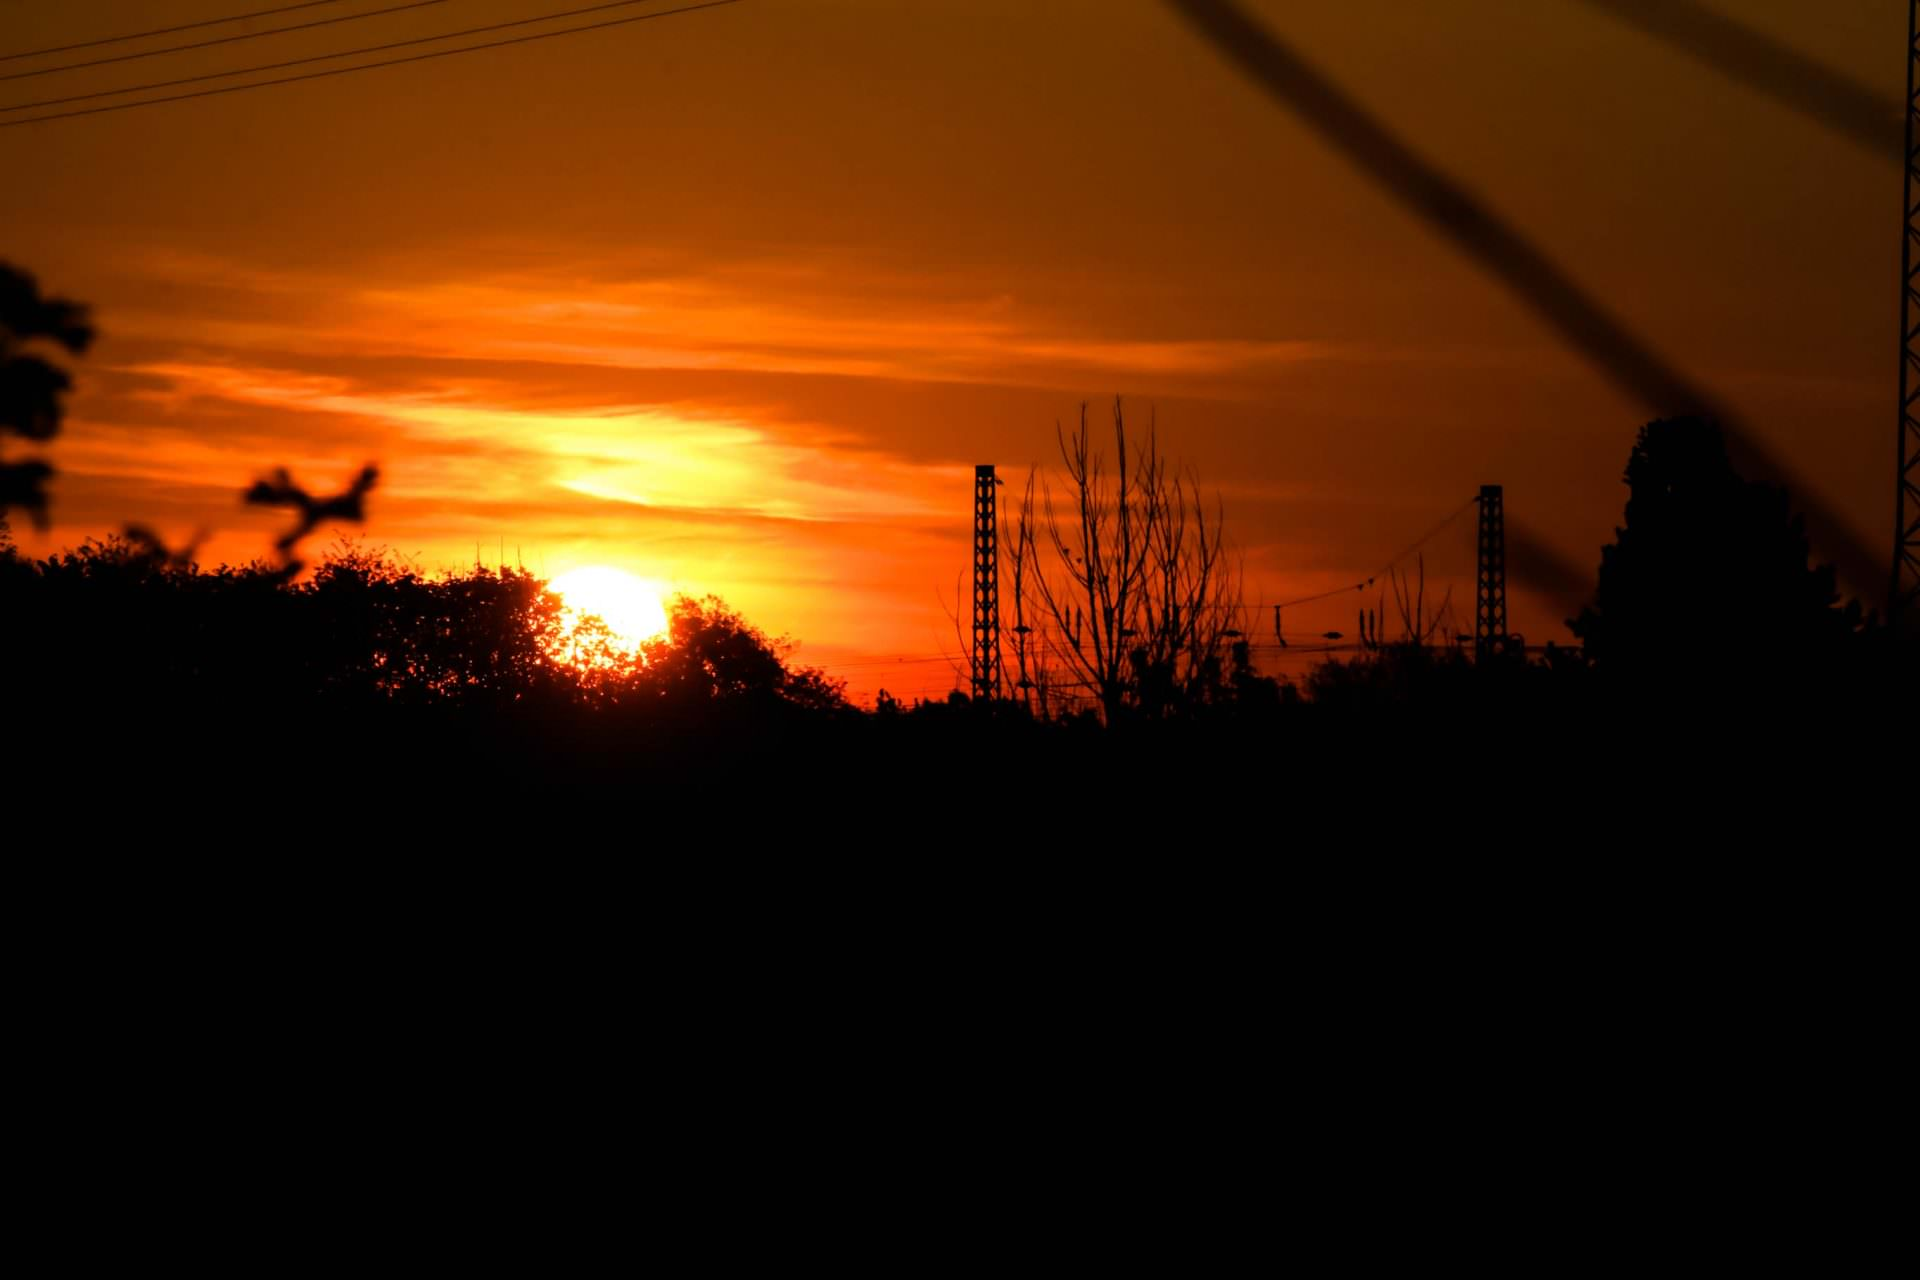 Sonnenaufgang in Duisburg